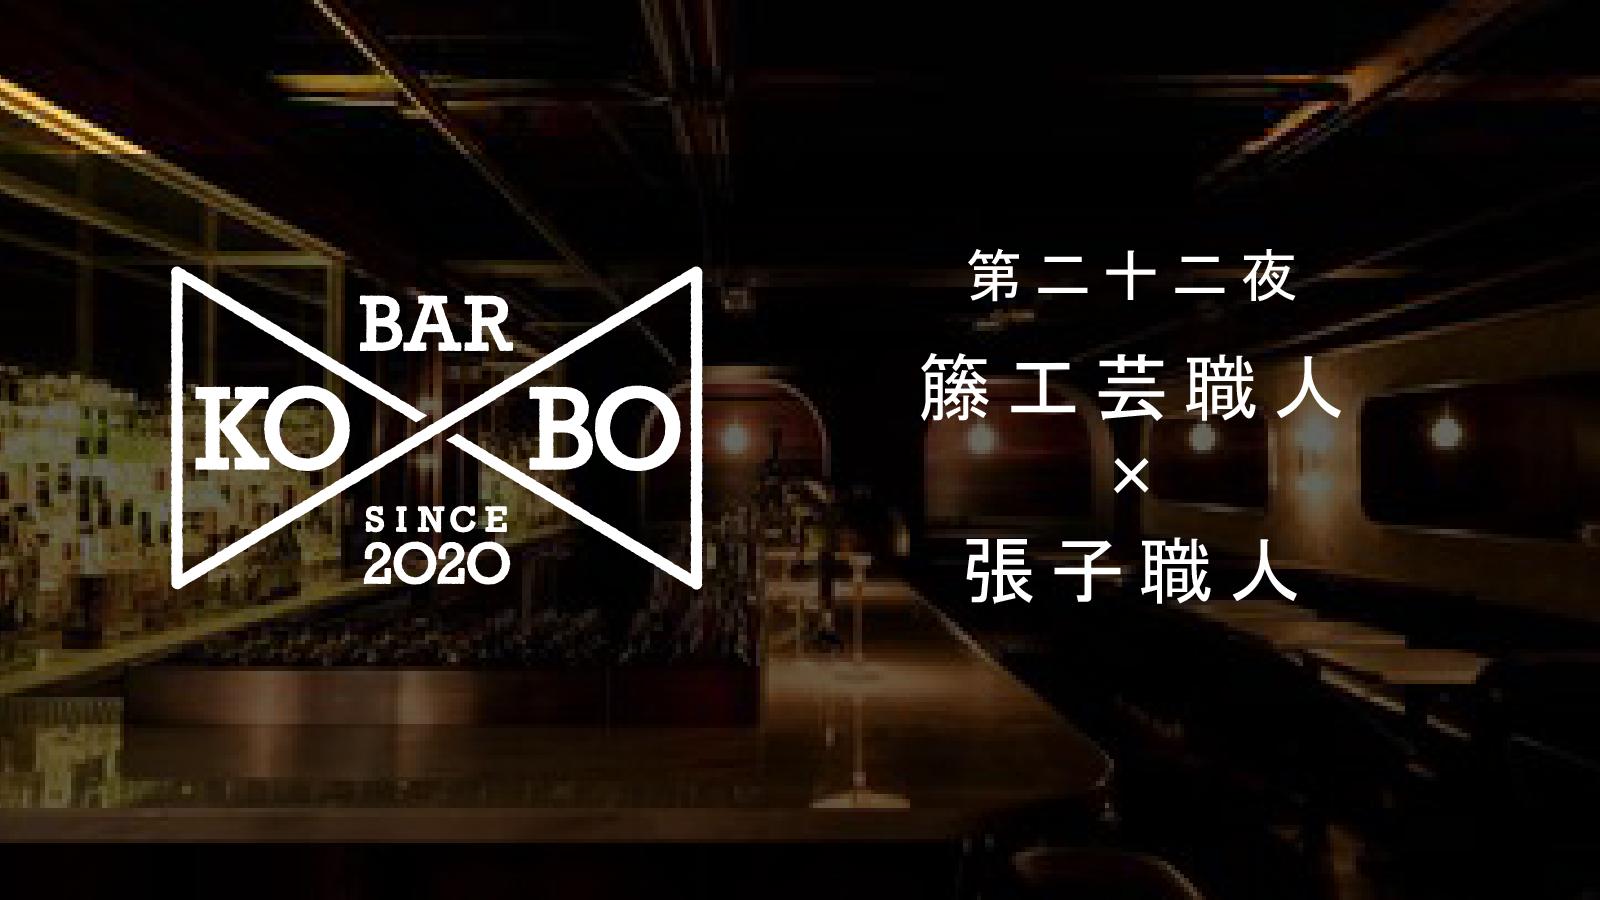 【Bar KO-BO 第二十二夜】籐工芸職人×張子職人